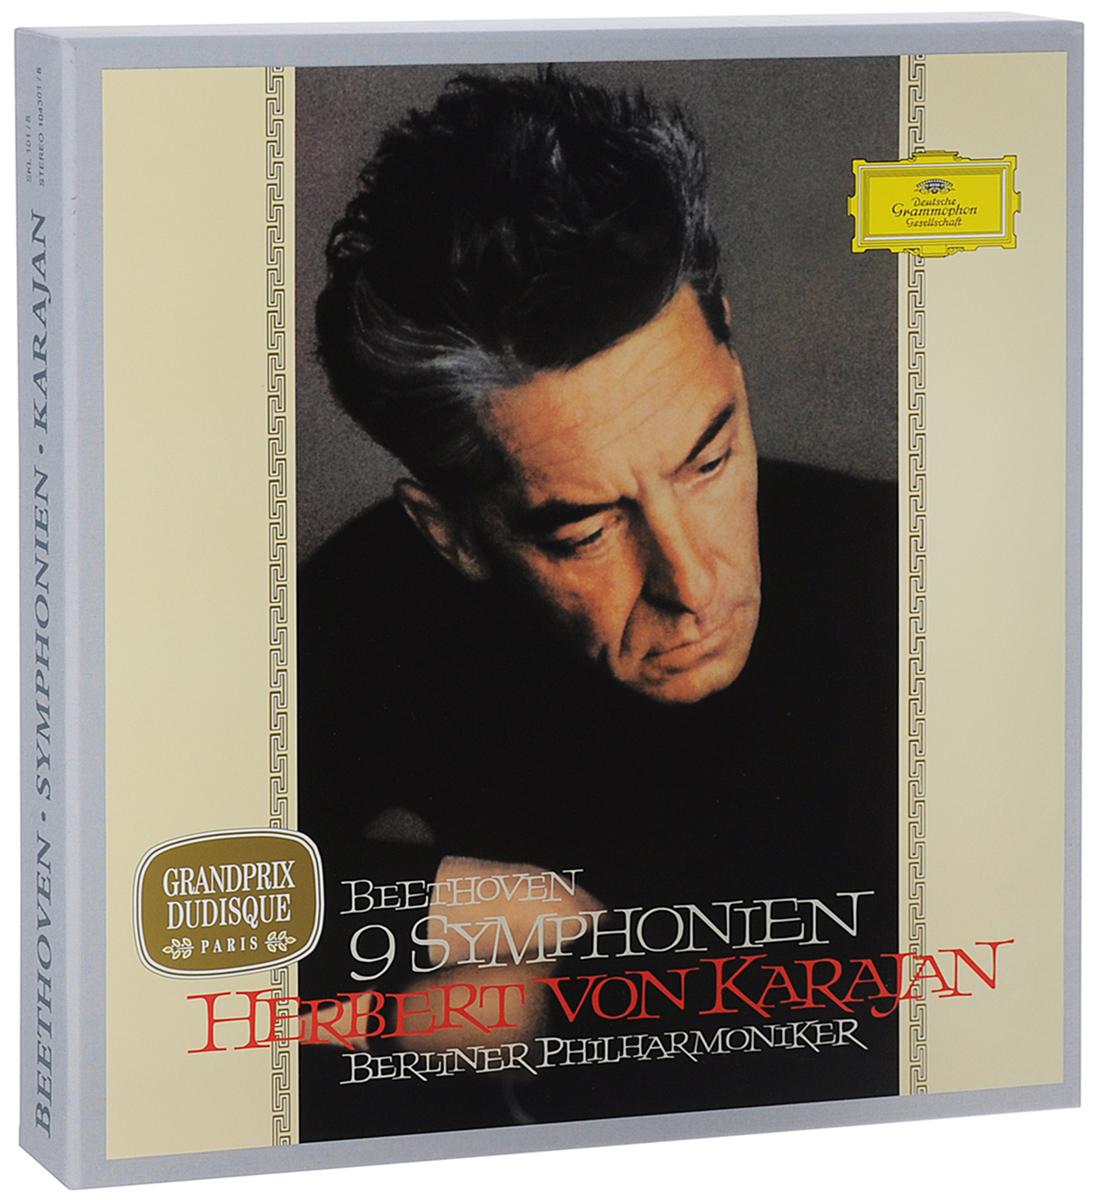 лучшая цена Герберт Караян,Berliner Philharmoniker Herbert von Karajan. Beethoven. 9 Symphonien. Limited Edition (8 LP)